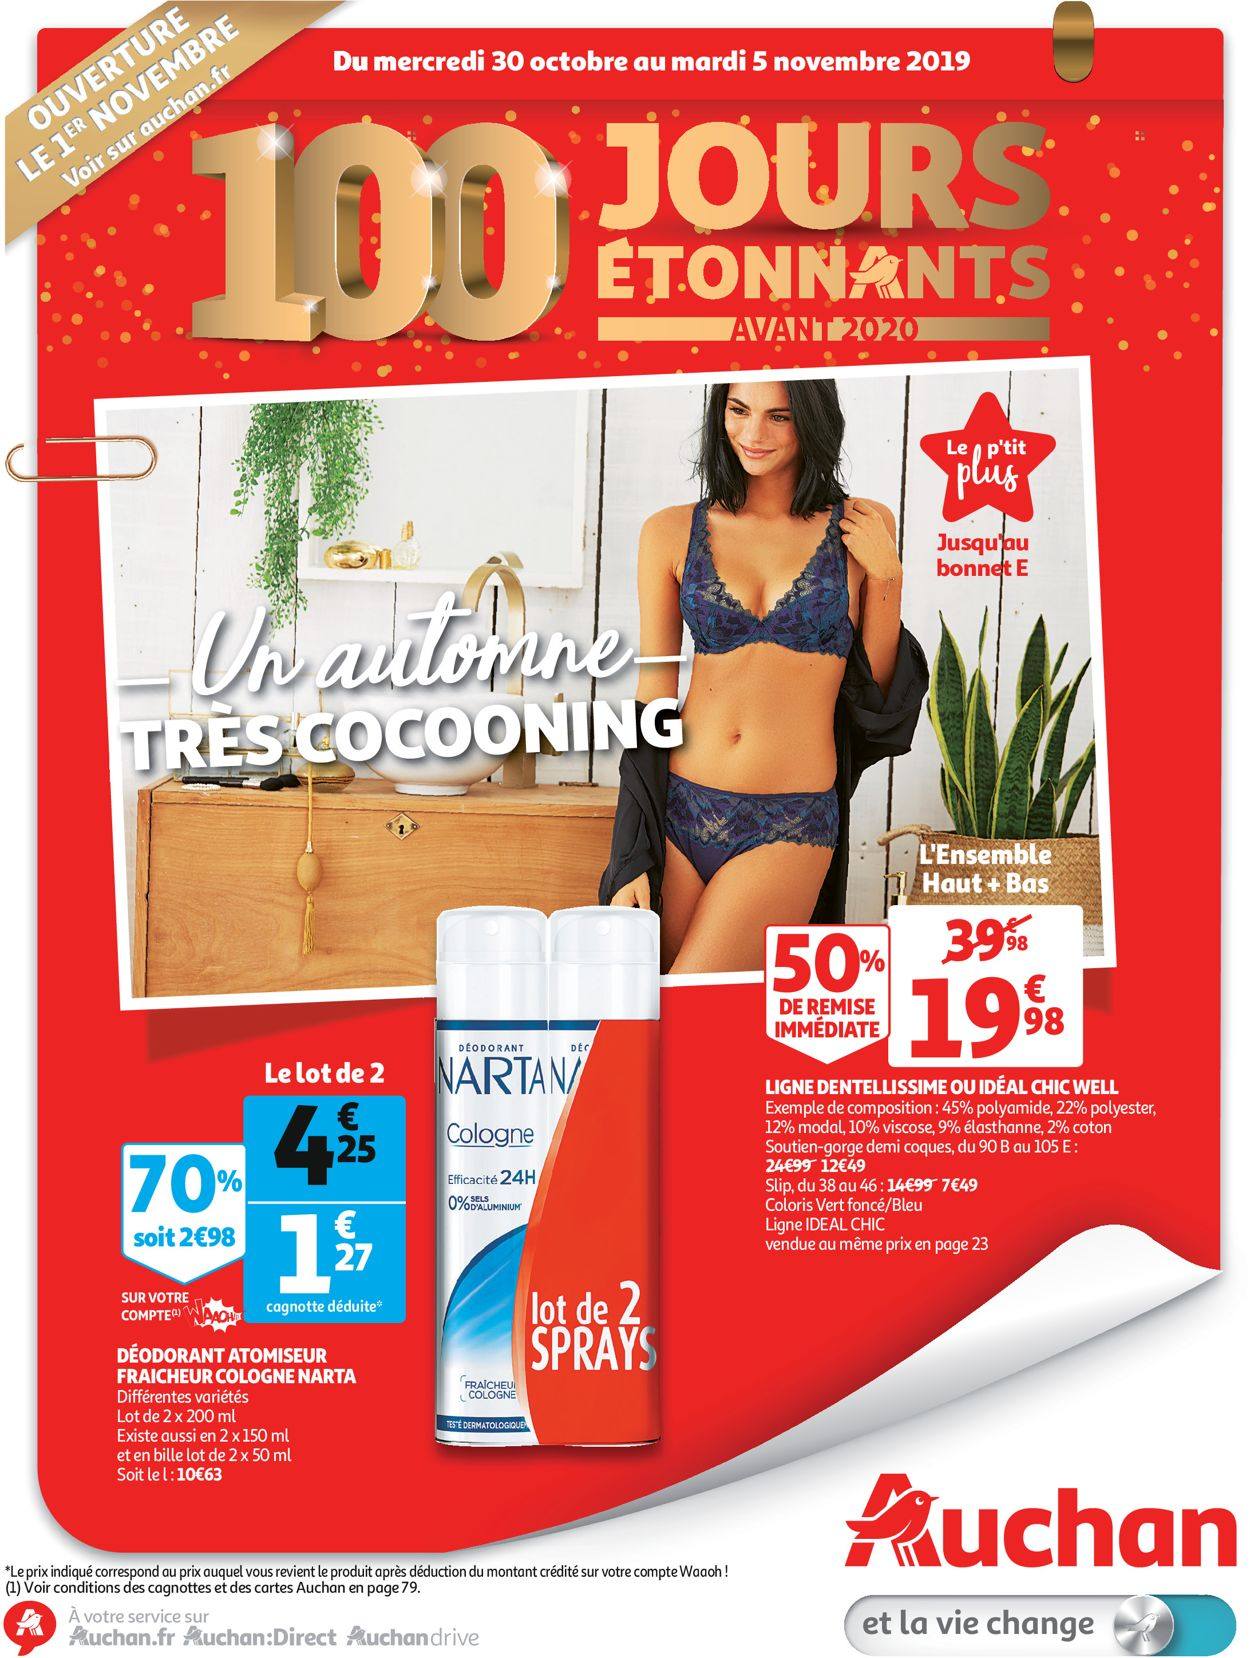 Auchan Catalogue - 30.10-05.11.2019